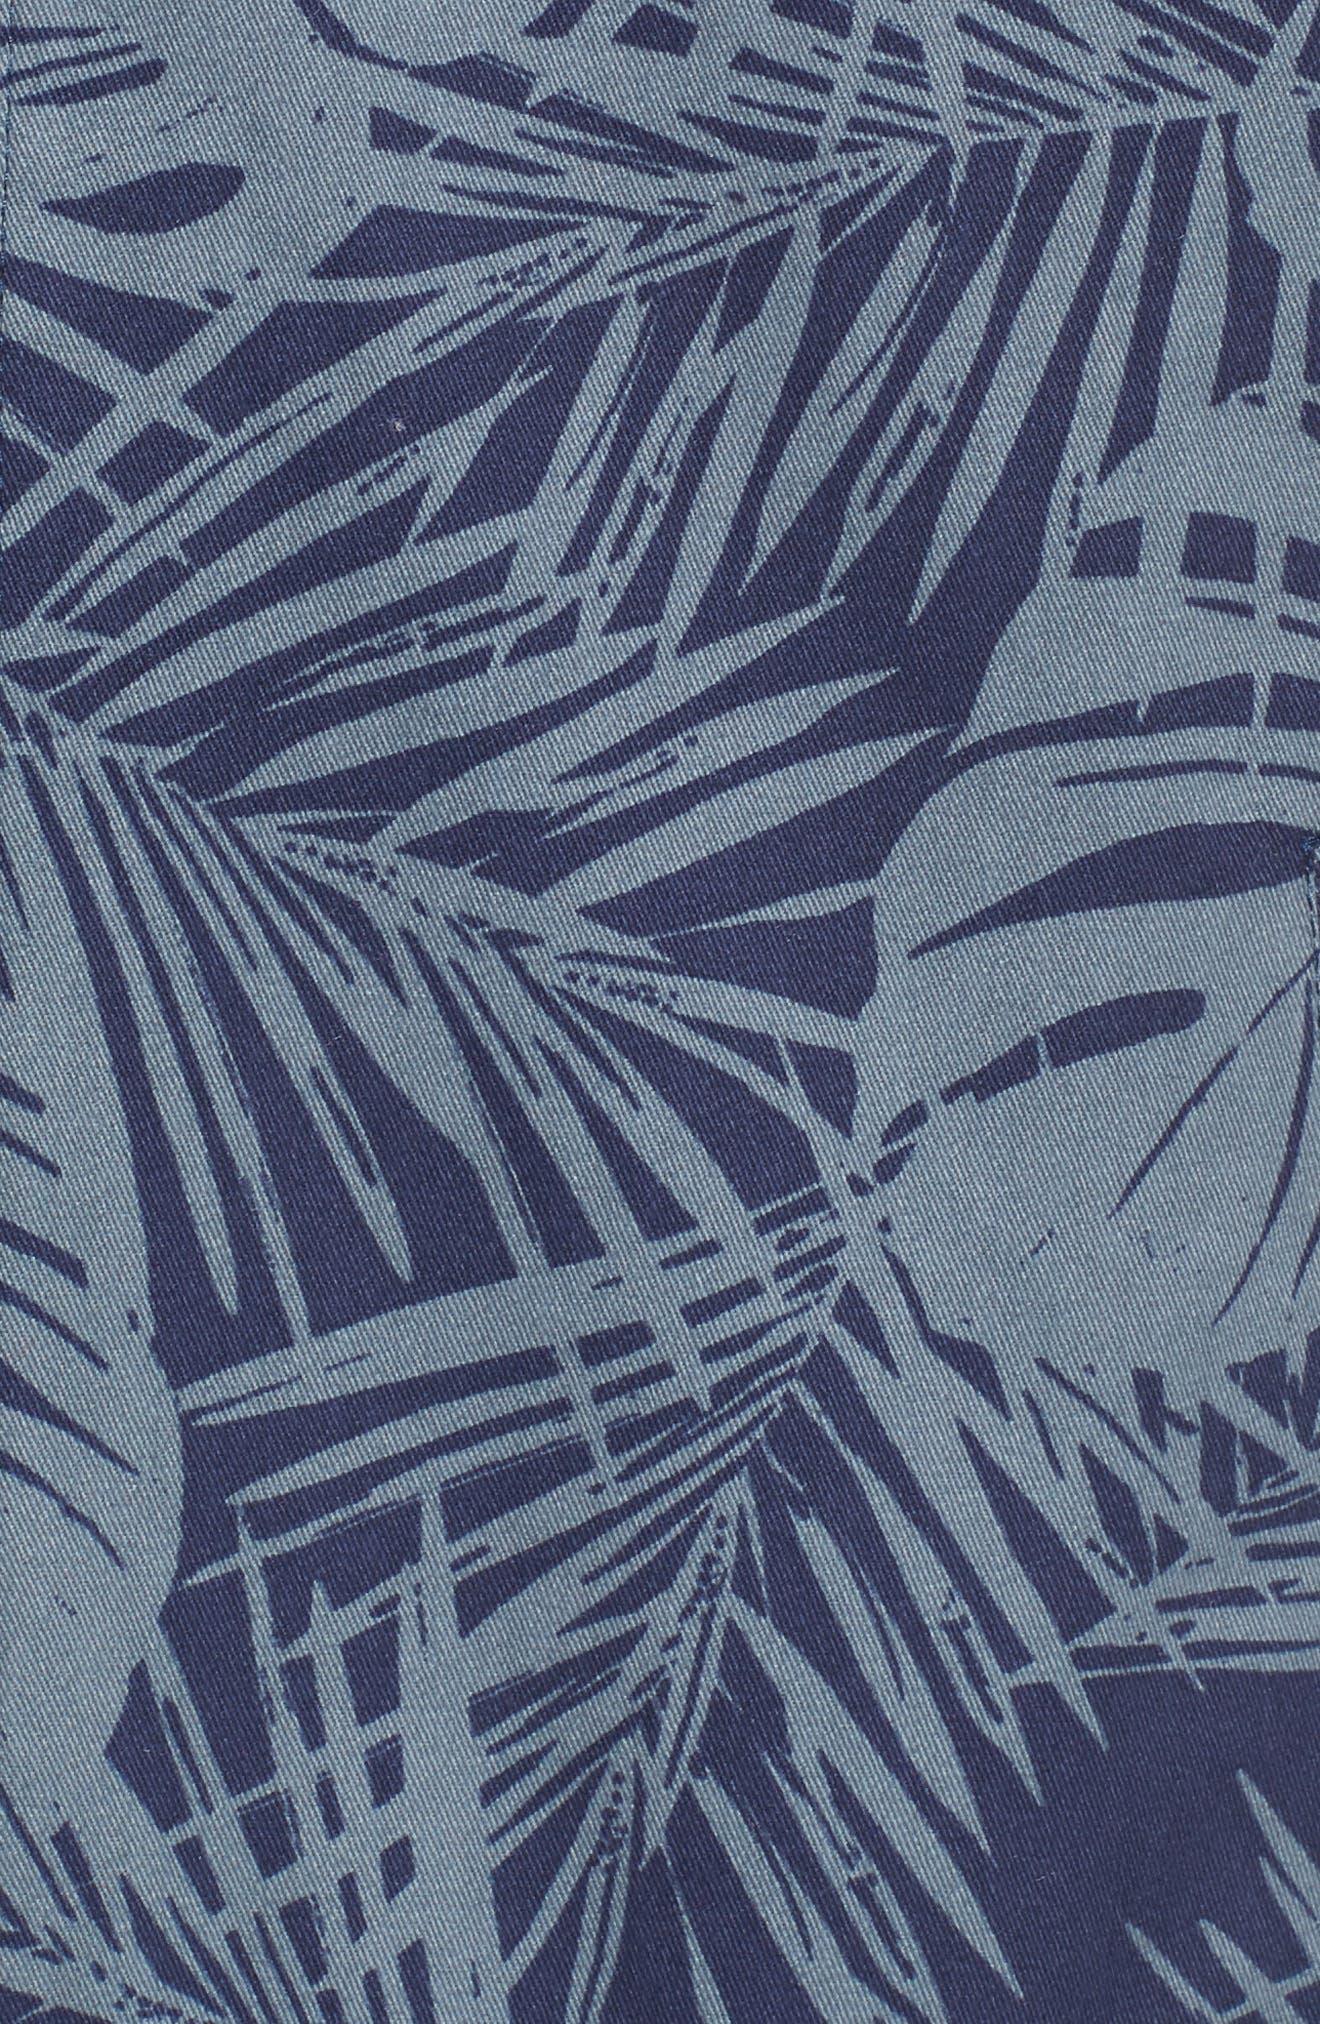 Print Bomber Jacket,                             Alternate thumbnail 5, color,                             Navy Peacoat Grey Palms